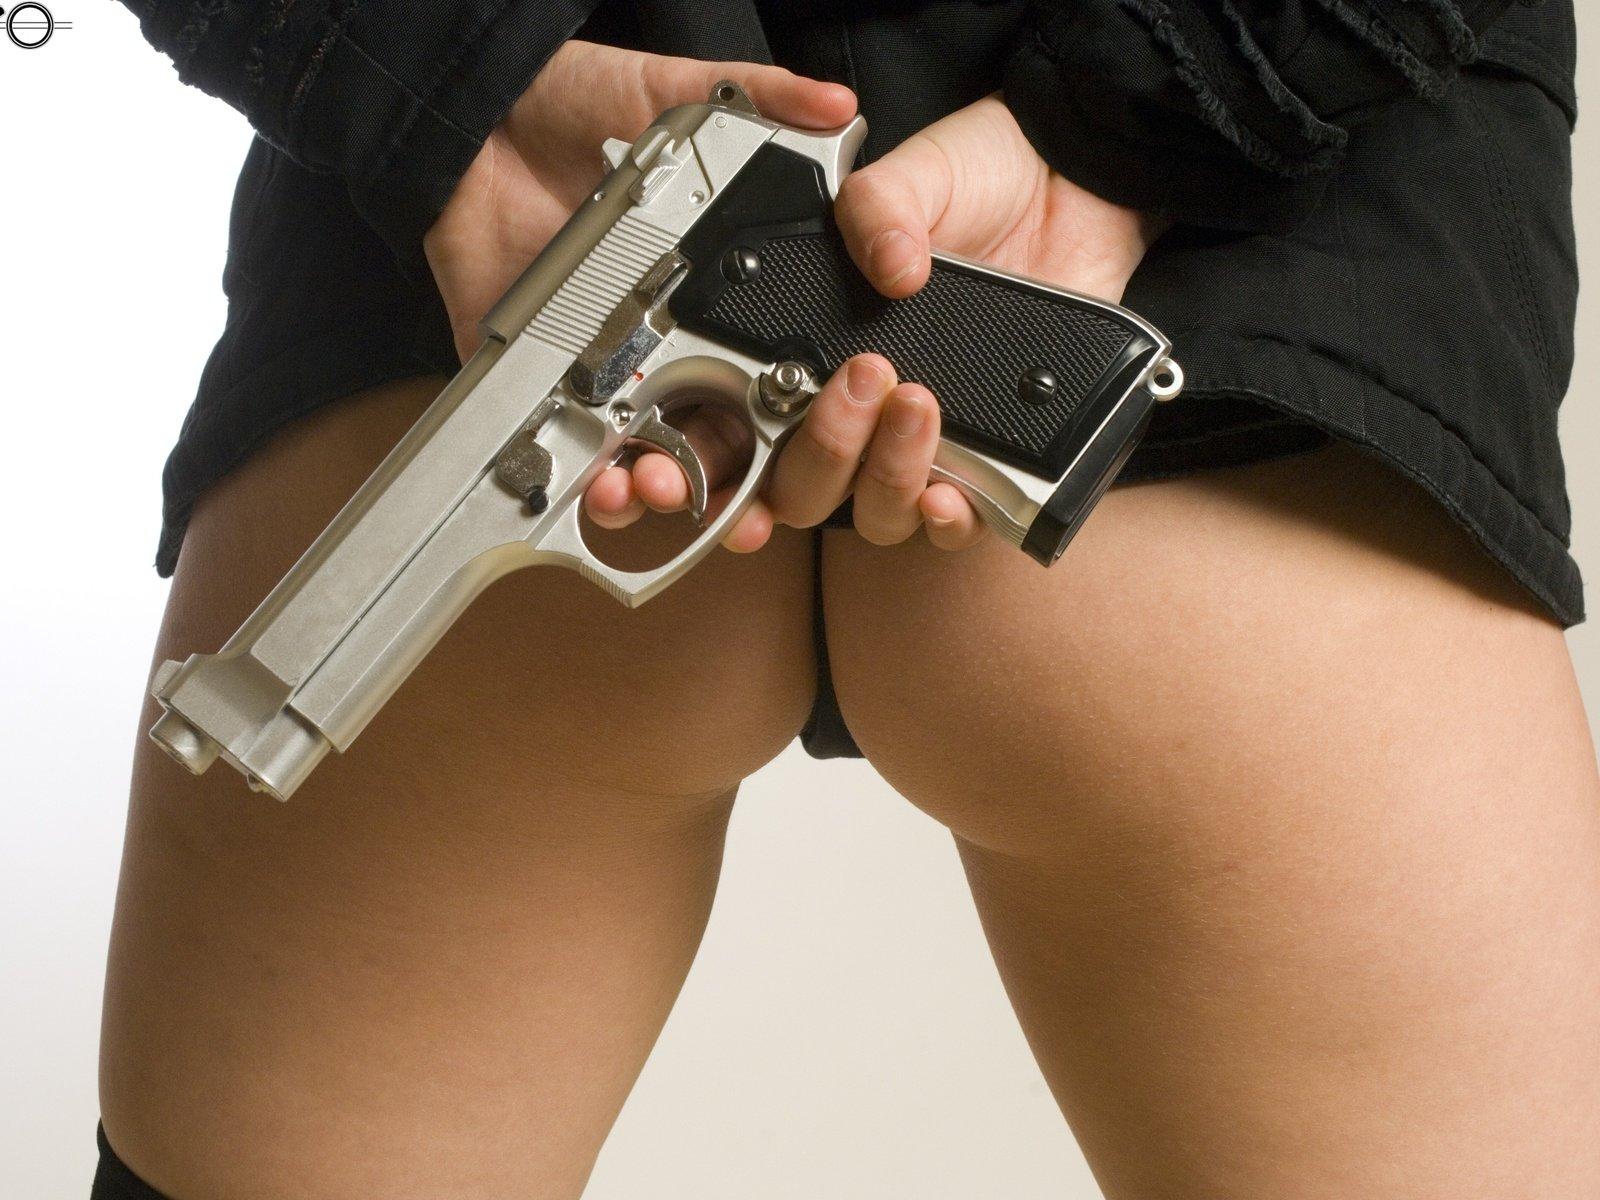 Guy puts gun in girls ass porn, wife serves black cock only